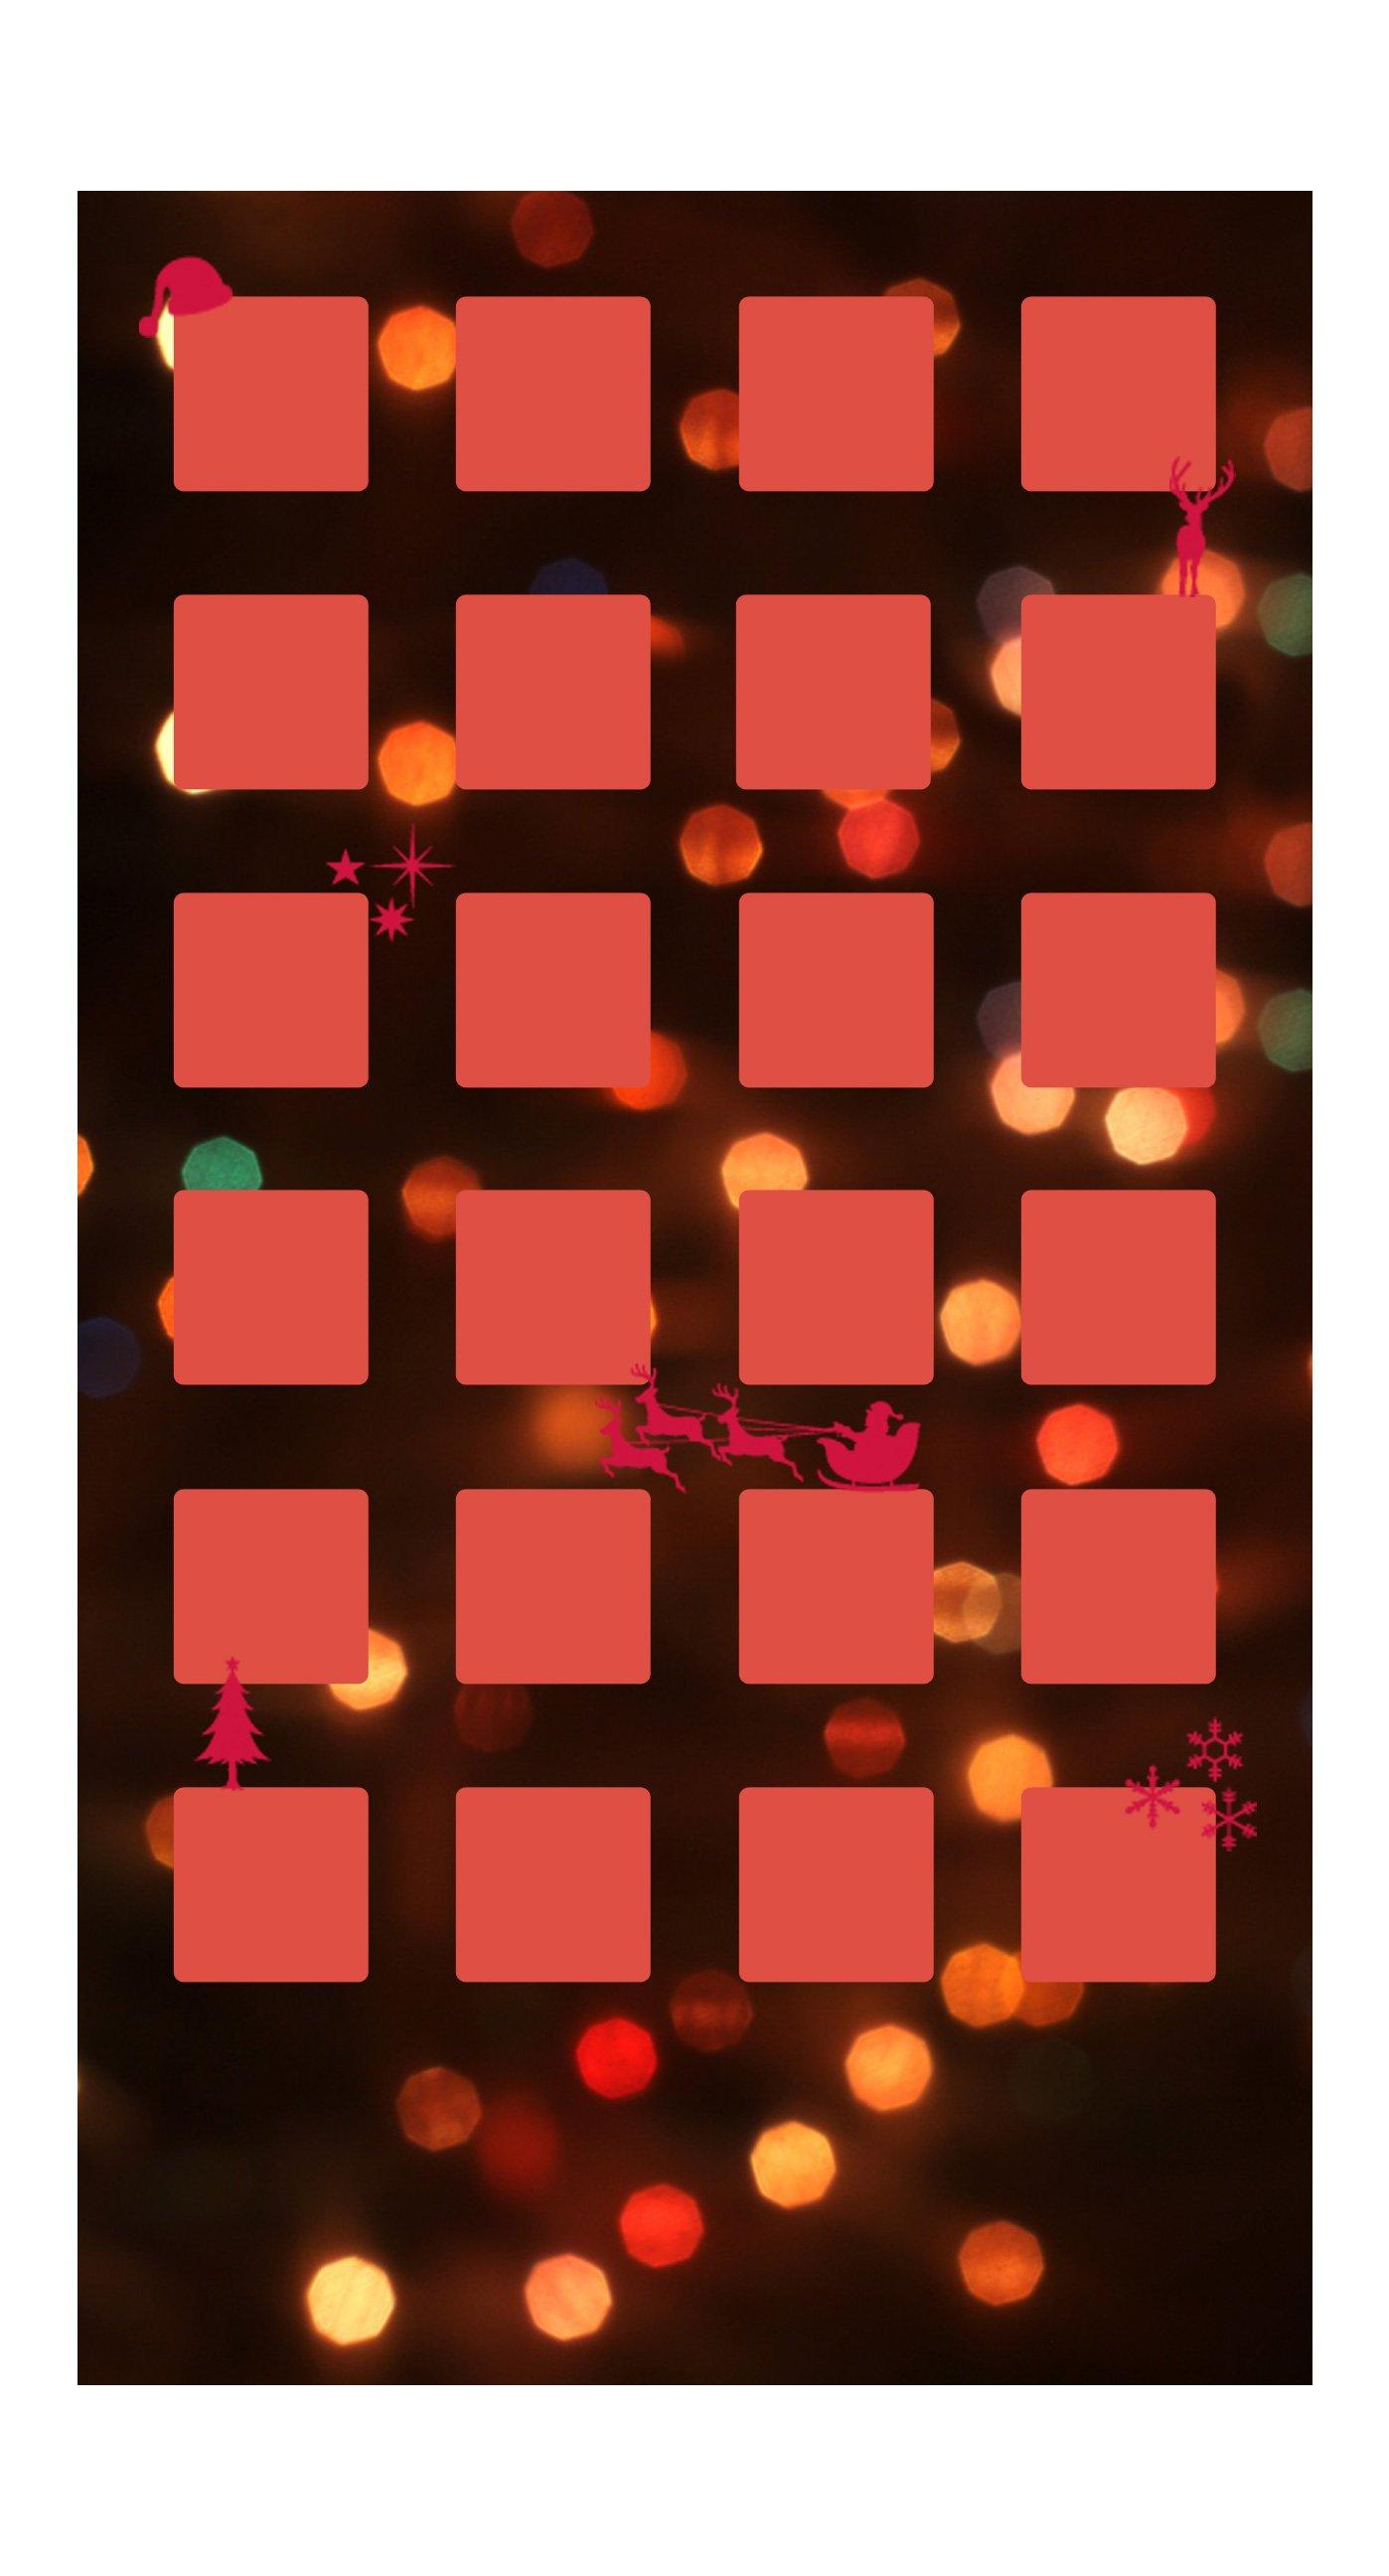 Shelf Christmas red light women wallpapersc iPhone7Plus 1398x2592